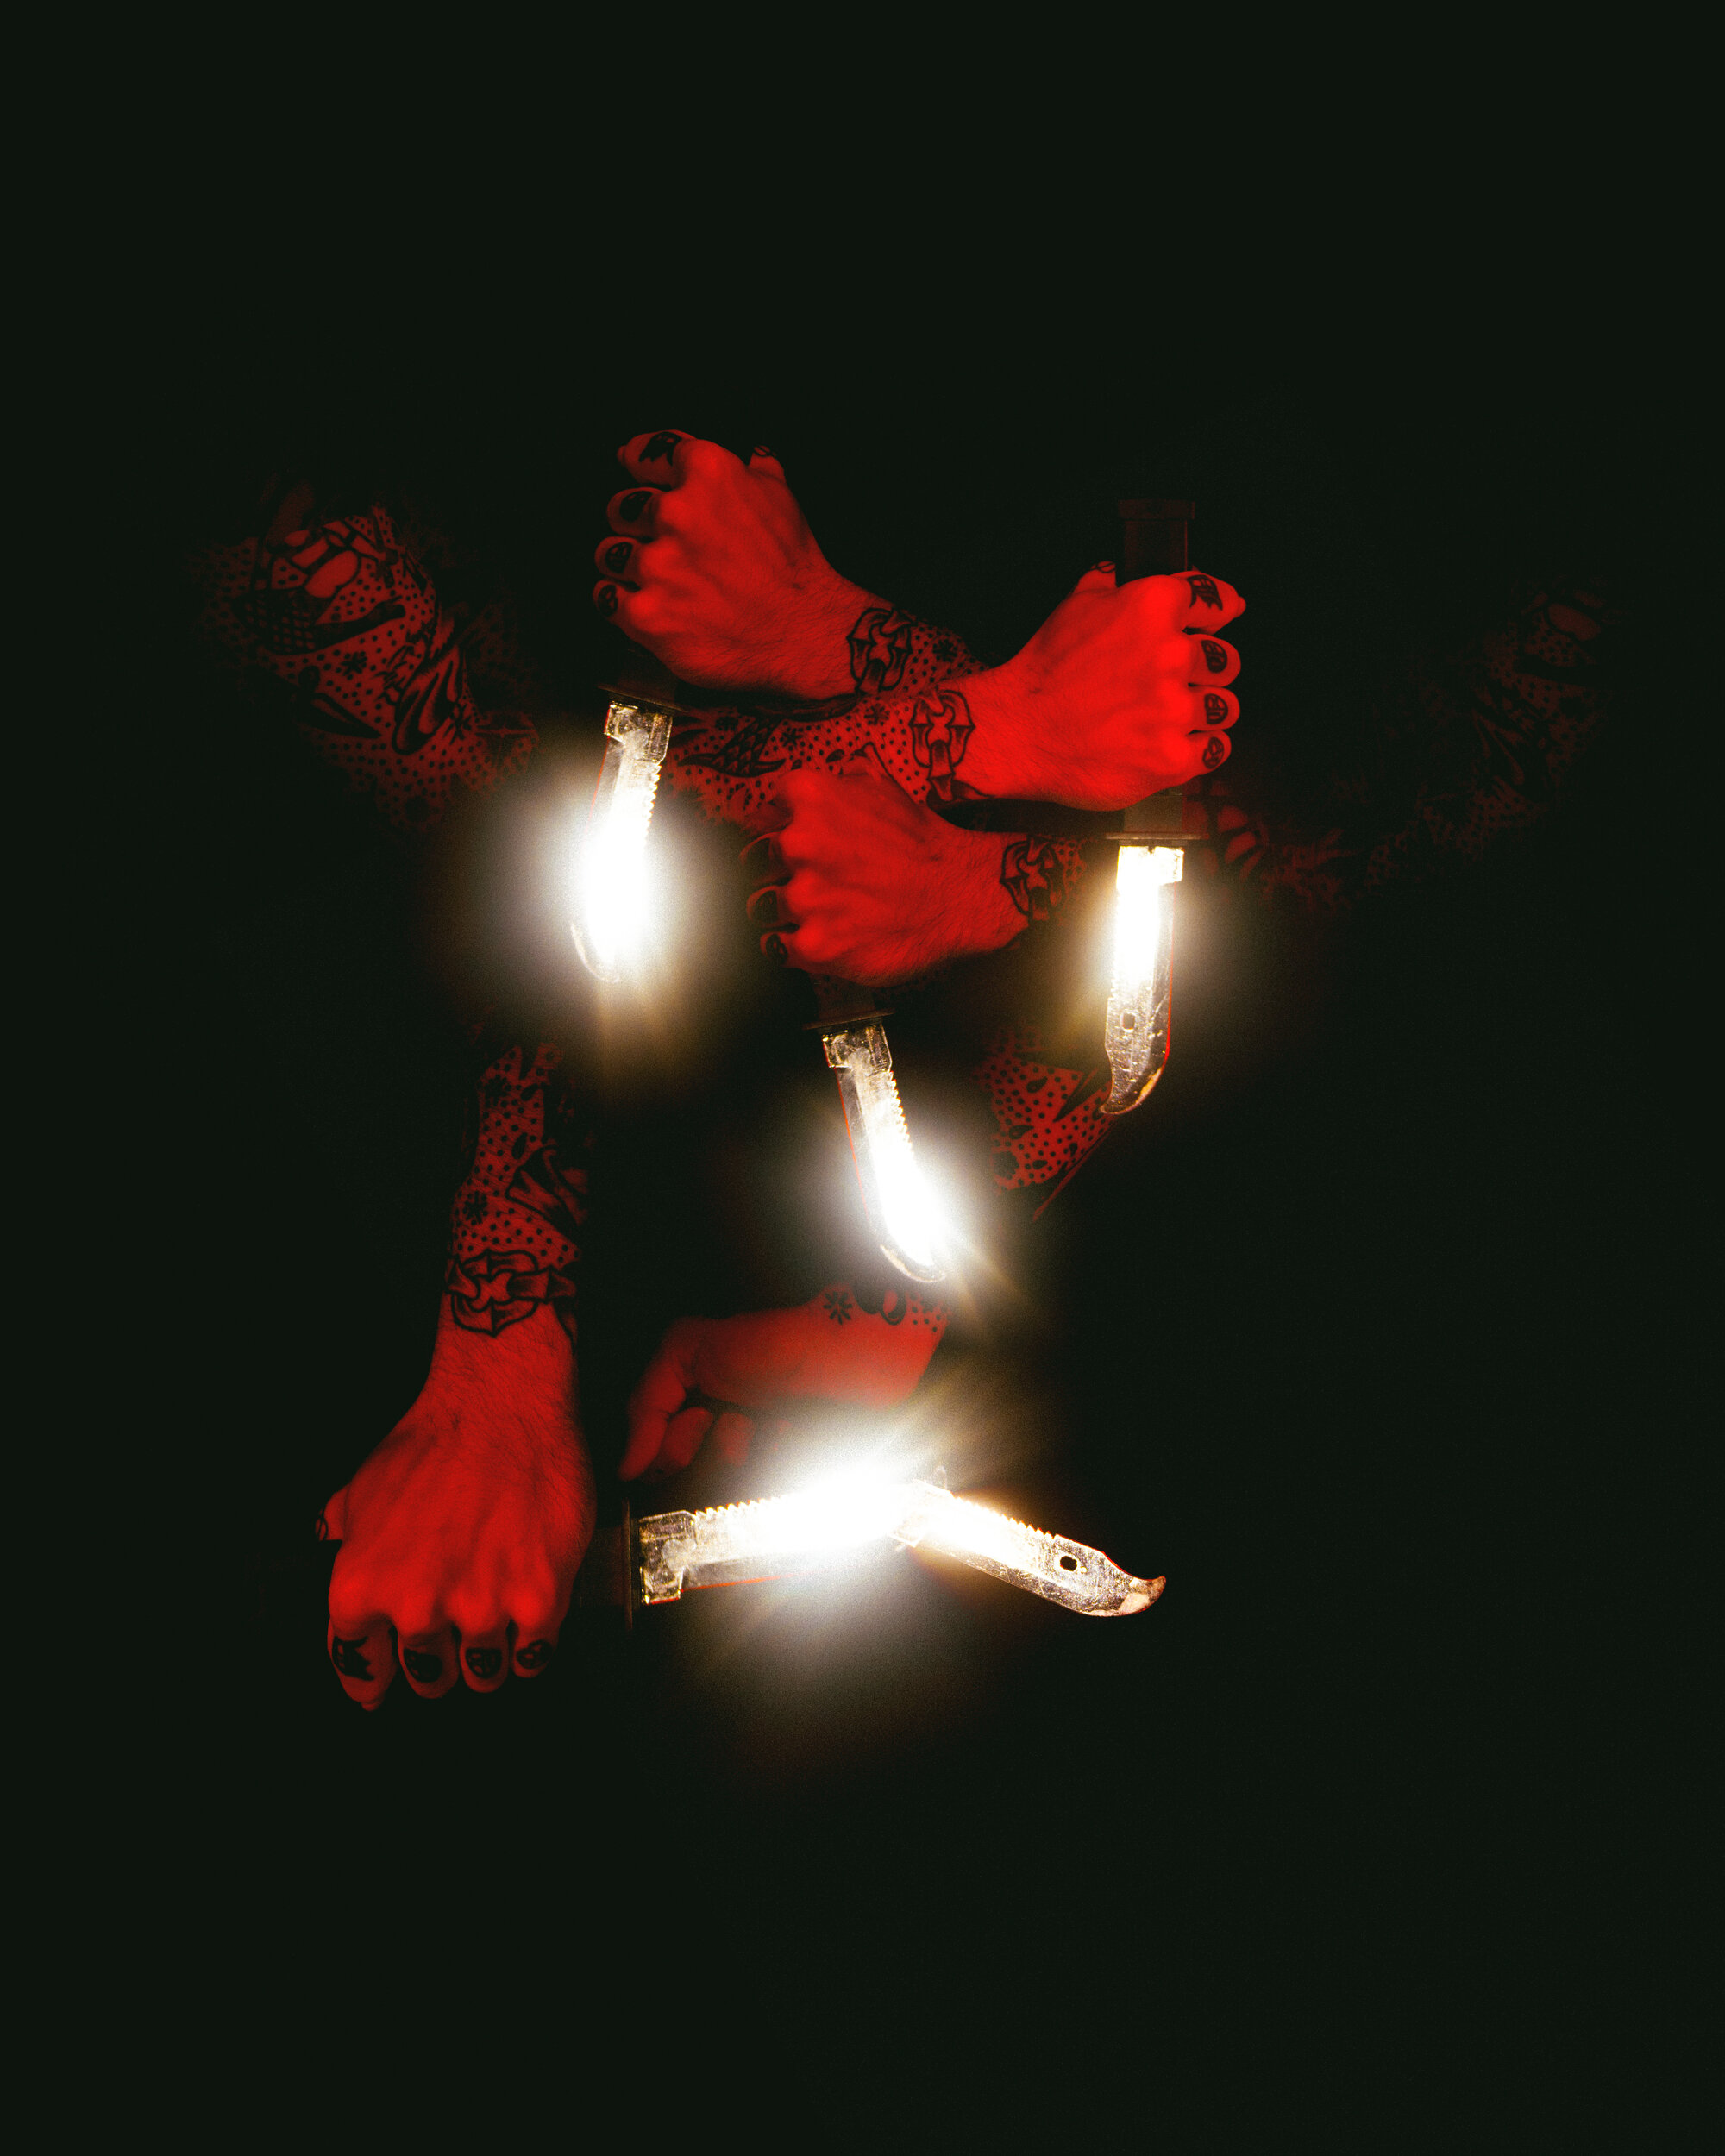 Knife-o-Lantern by Robert Hickerson